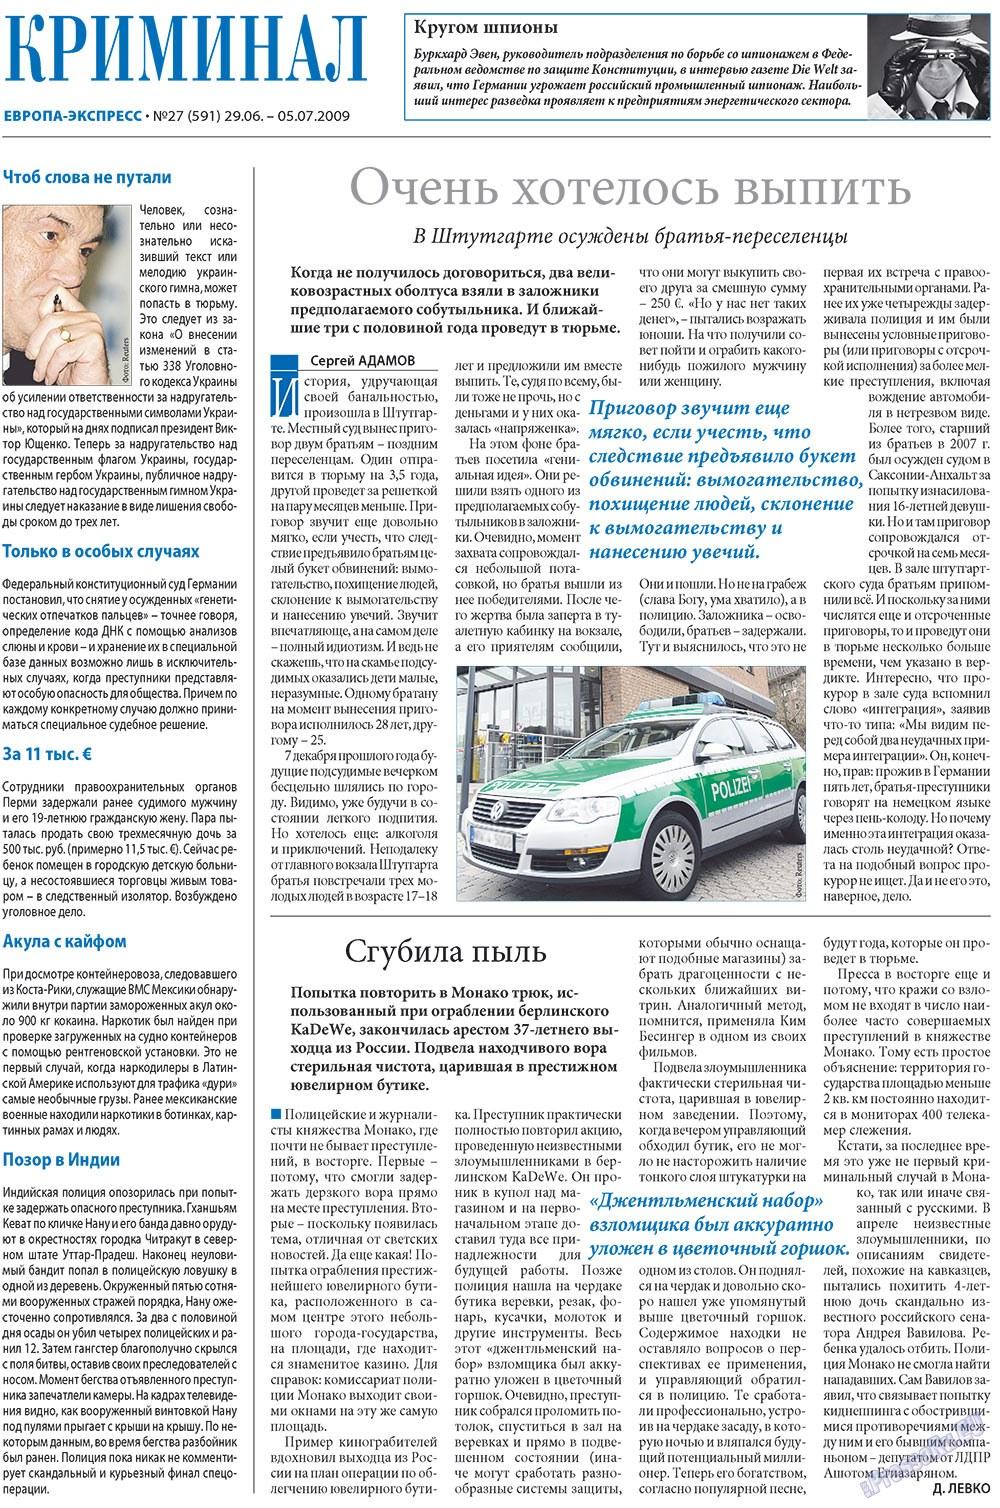 Европа экспресс (газета). 2009 год, номер 27, стр. 21